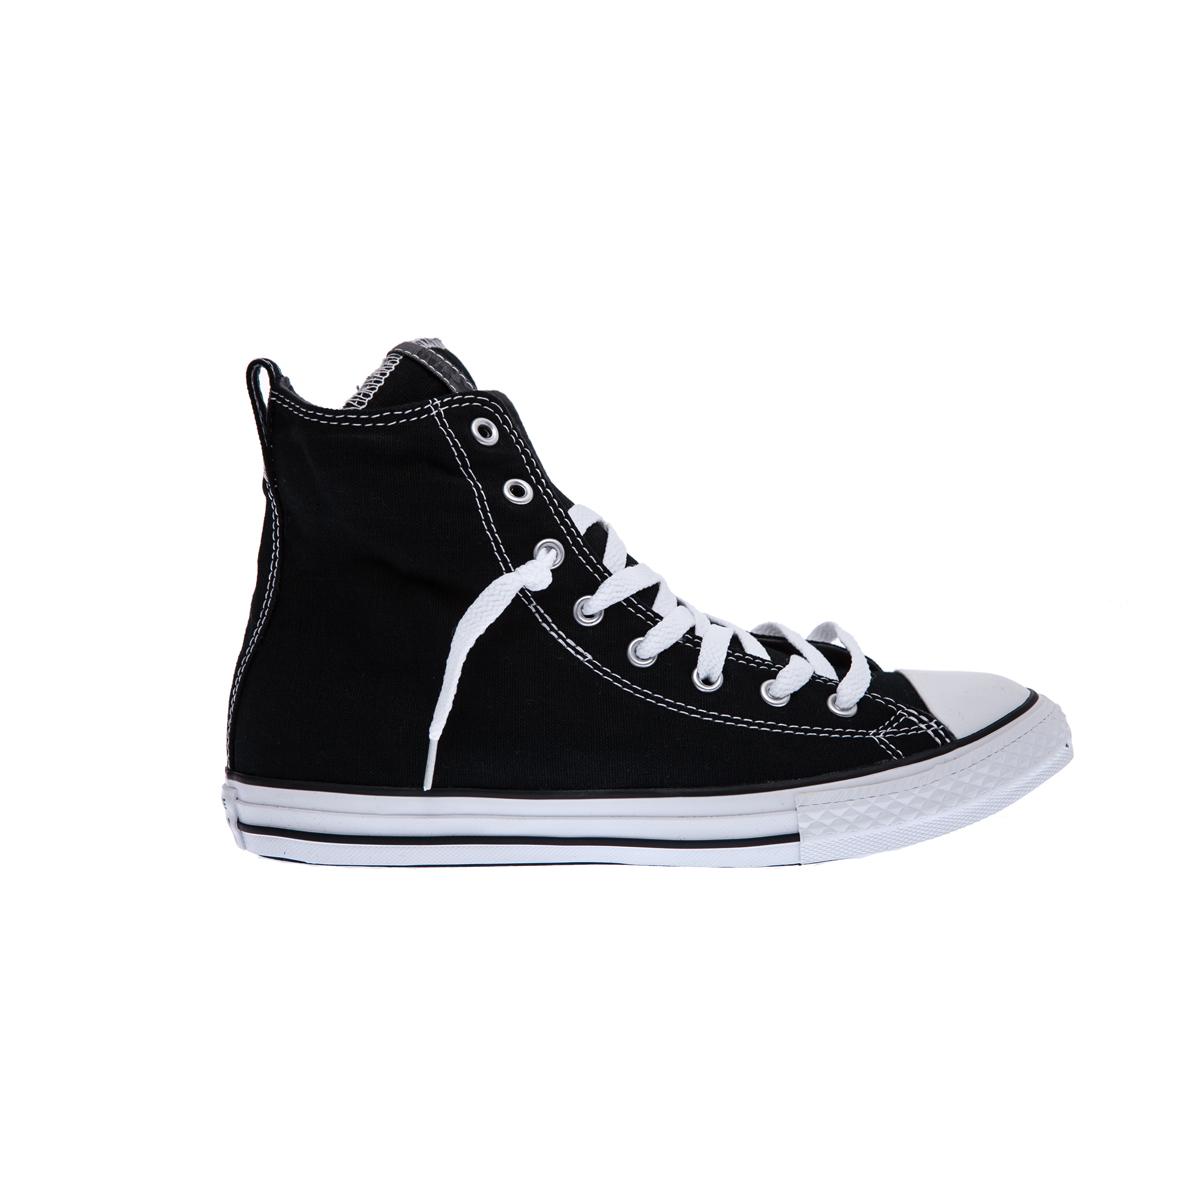 CONVERSE – Παιδικά παπούτσια Chuck Taylor All Star Slip It μαύρα